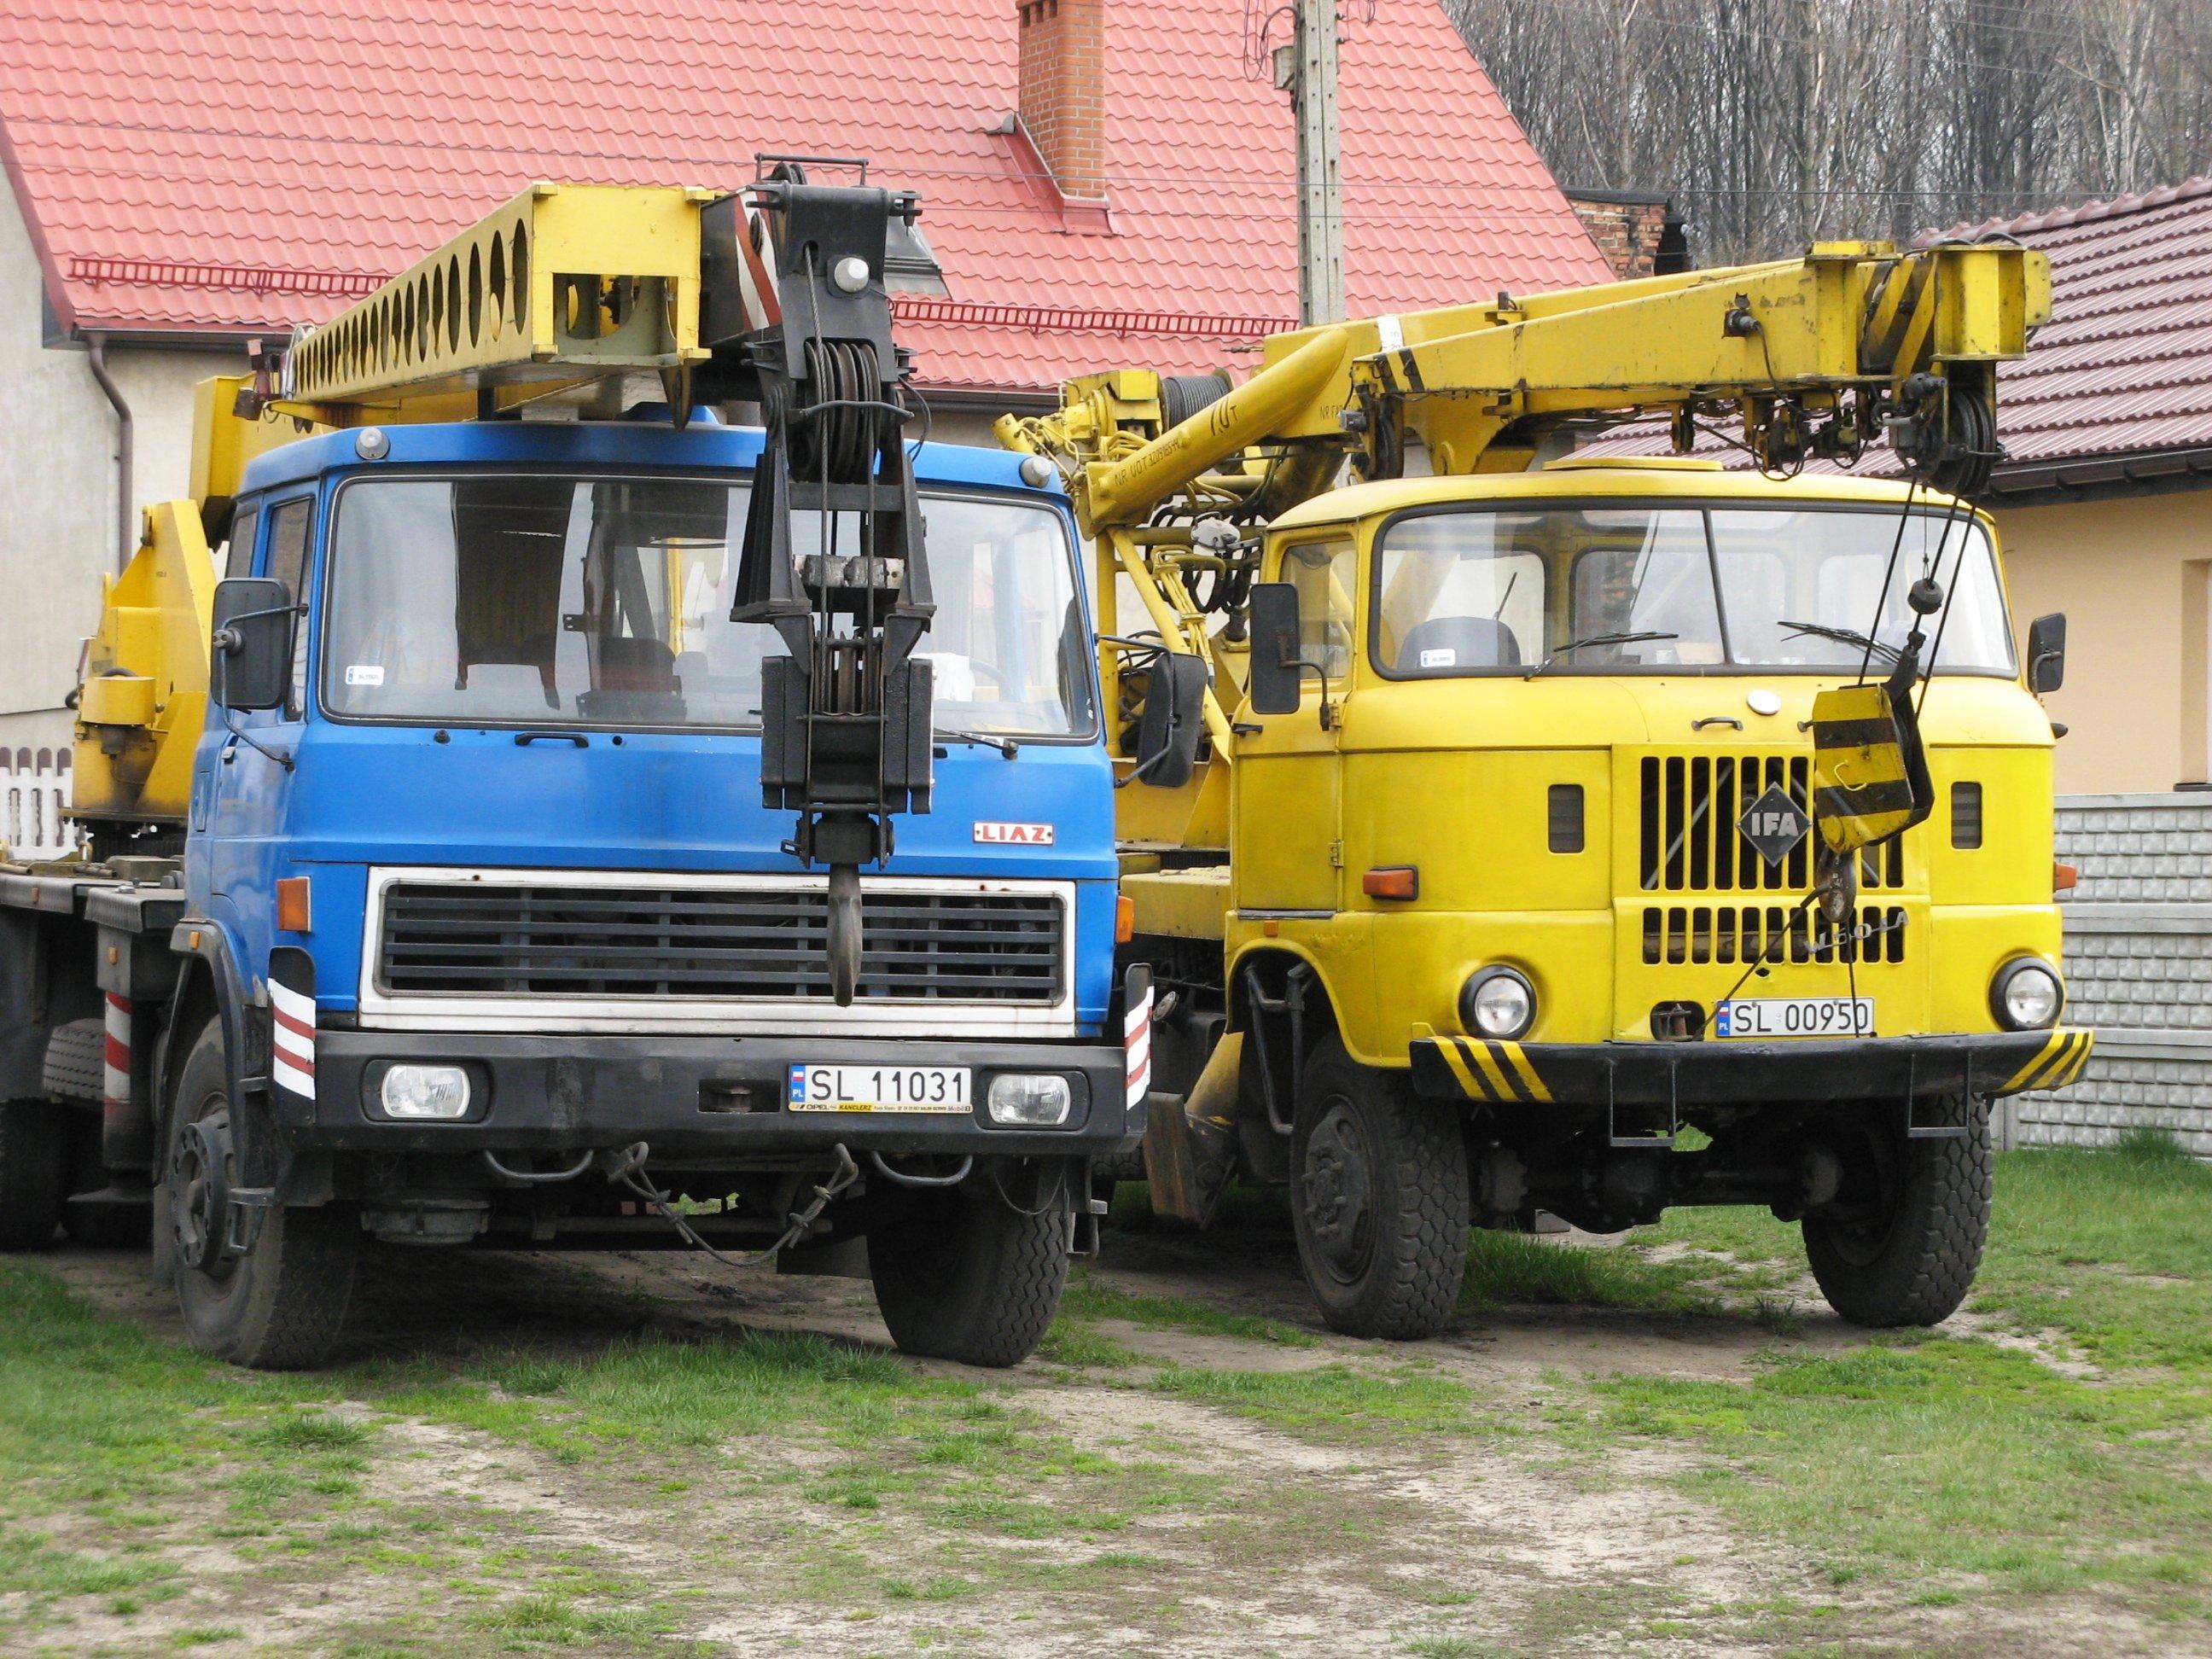 escavatori takraf macchinari industriali TAKRAF_ADK_70_and_LIAZ_crane_Trucks